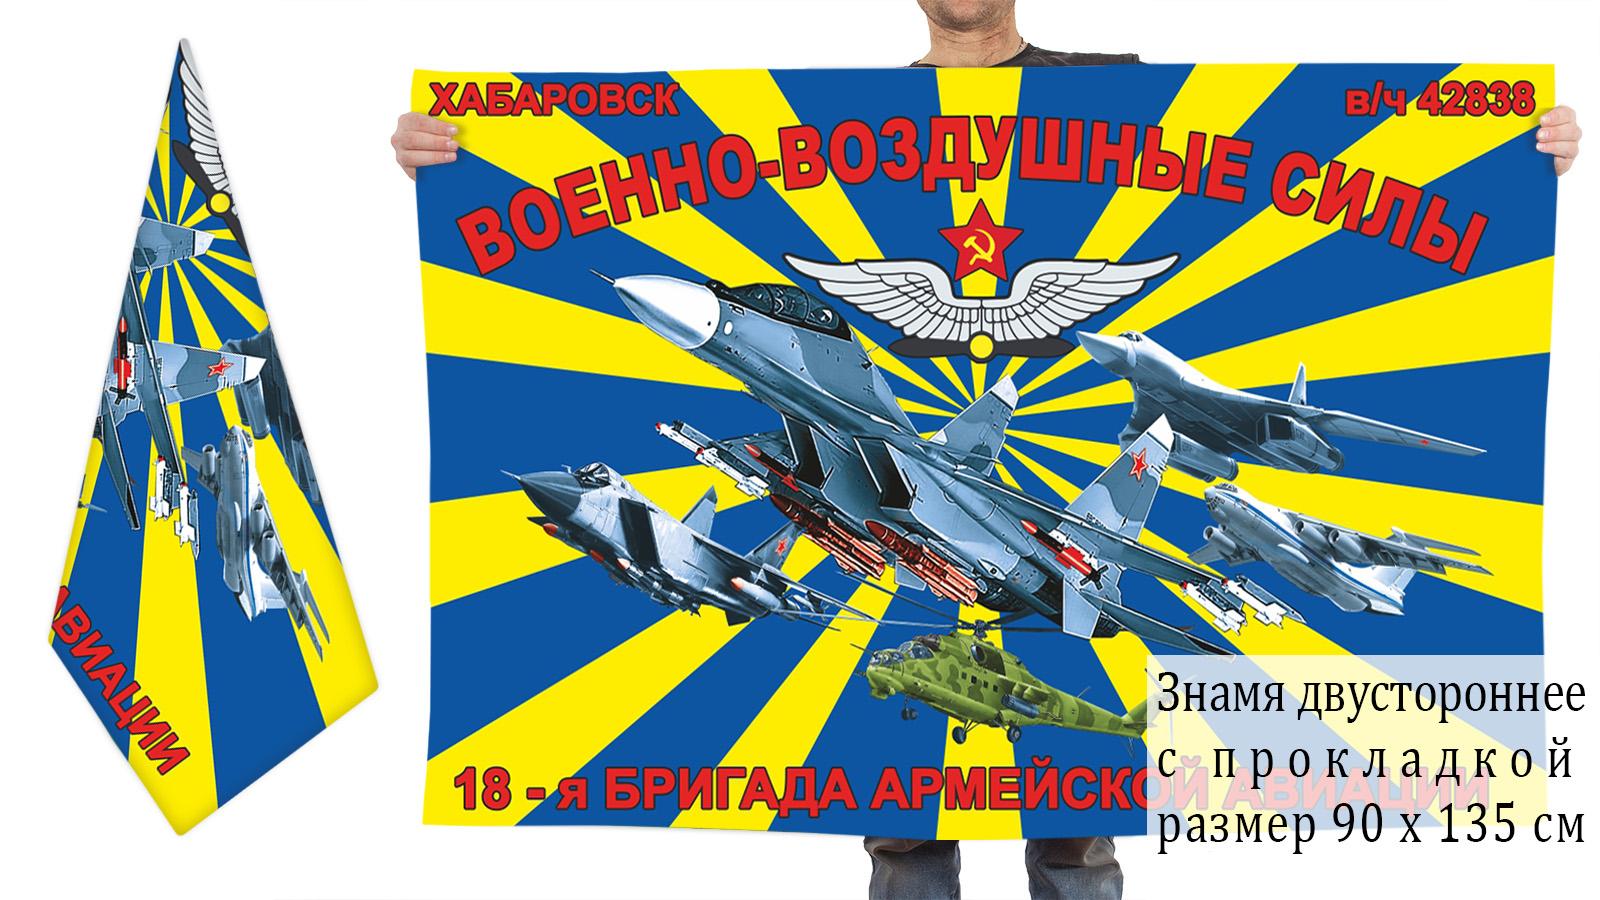 Заказать двухсторонний флаг 18-я бригада армейской авиации ВВС